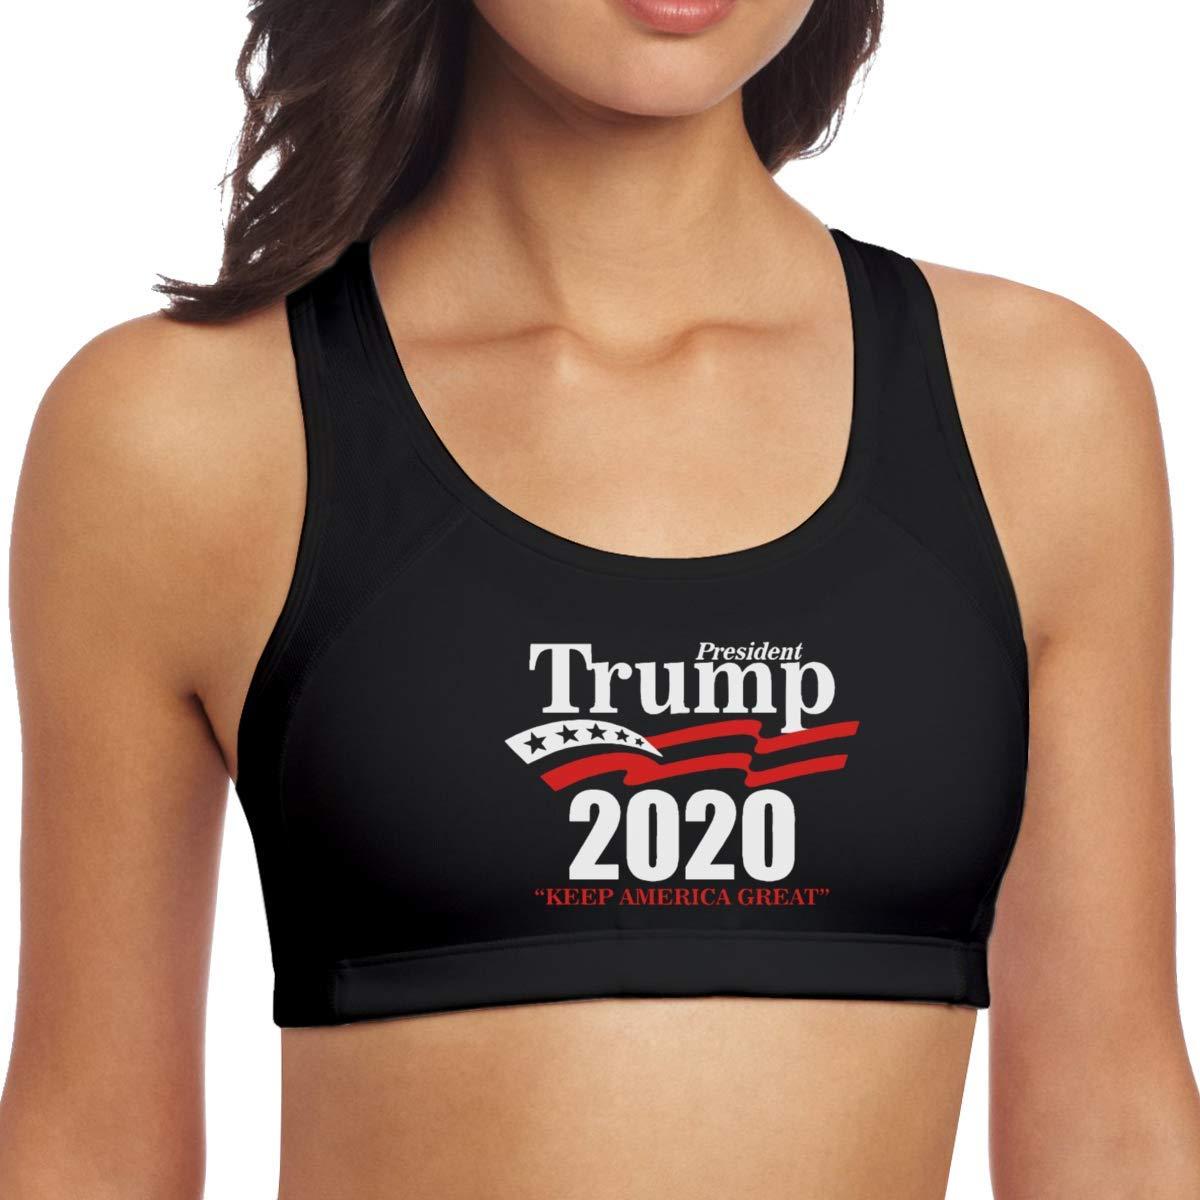 JAKE WYATT President Trump 2020 Keep America Great Yoga Vest Racerbacks